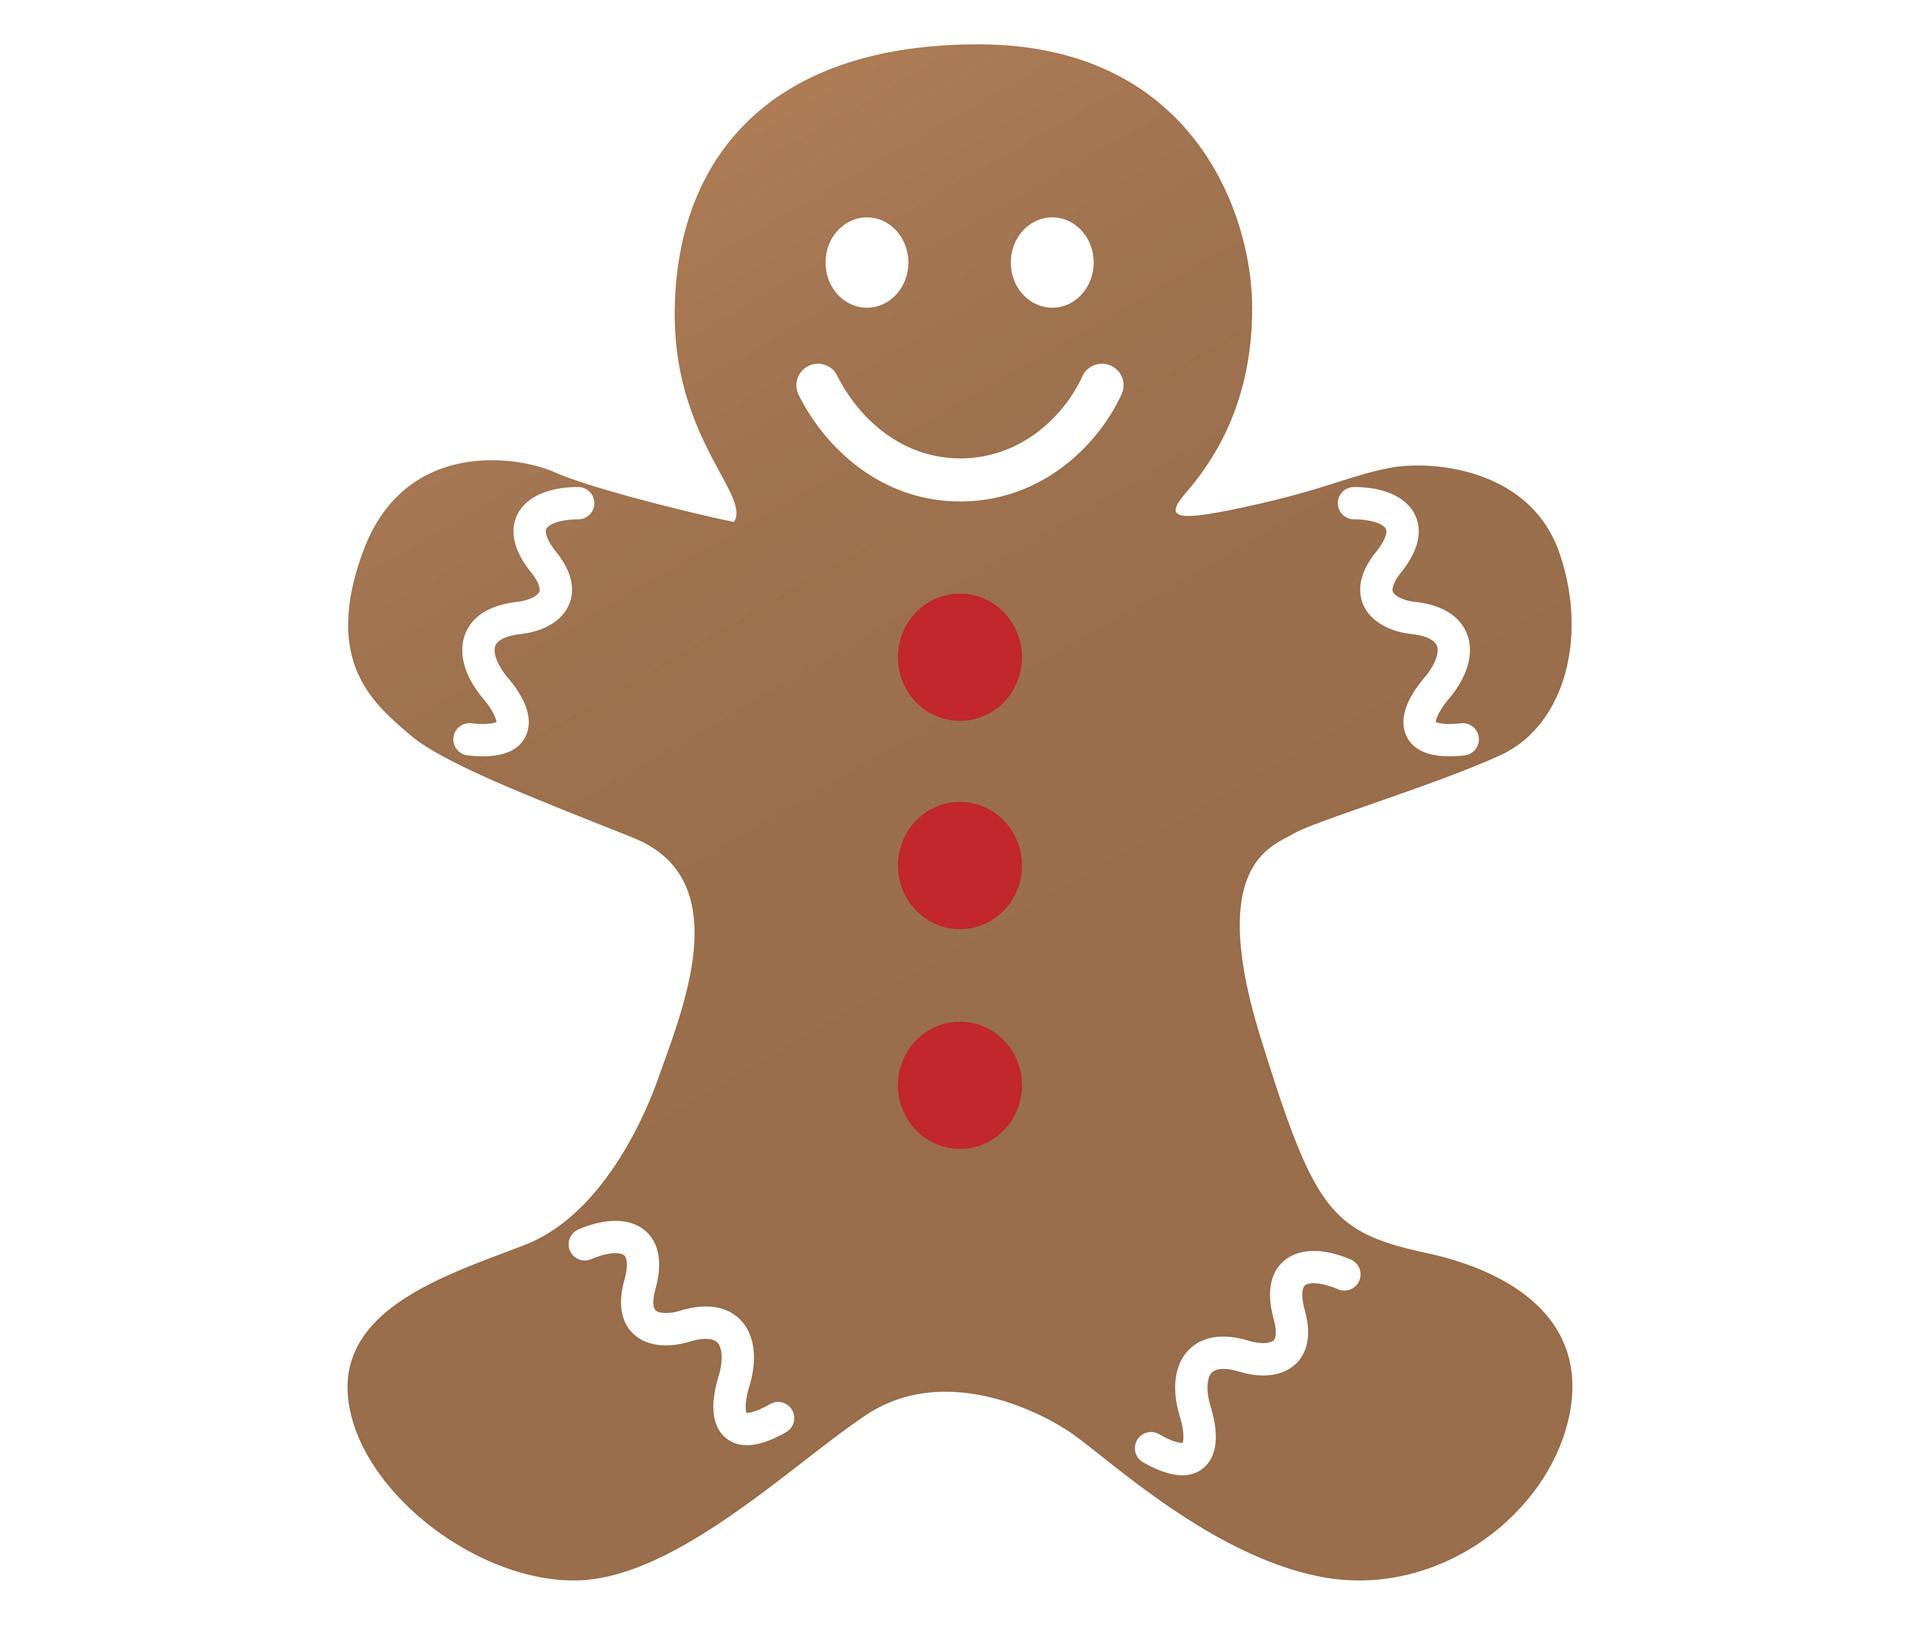 1920x1625 Gingerbread Man Clip Art Thatswhatsup